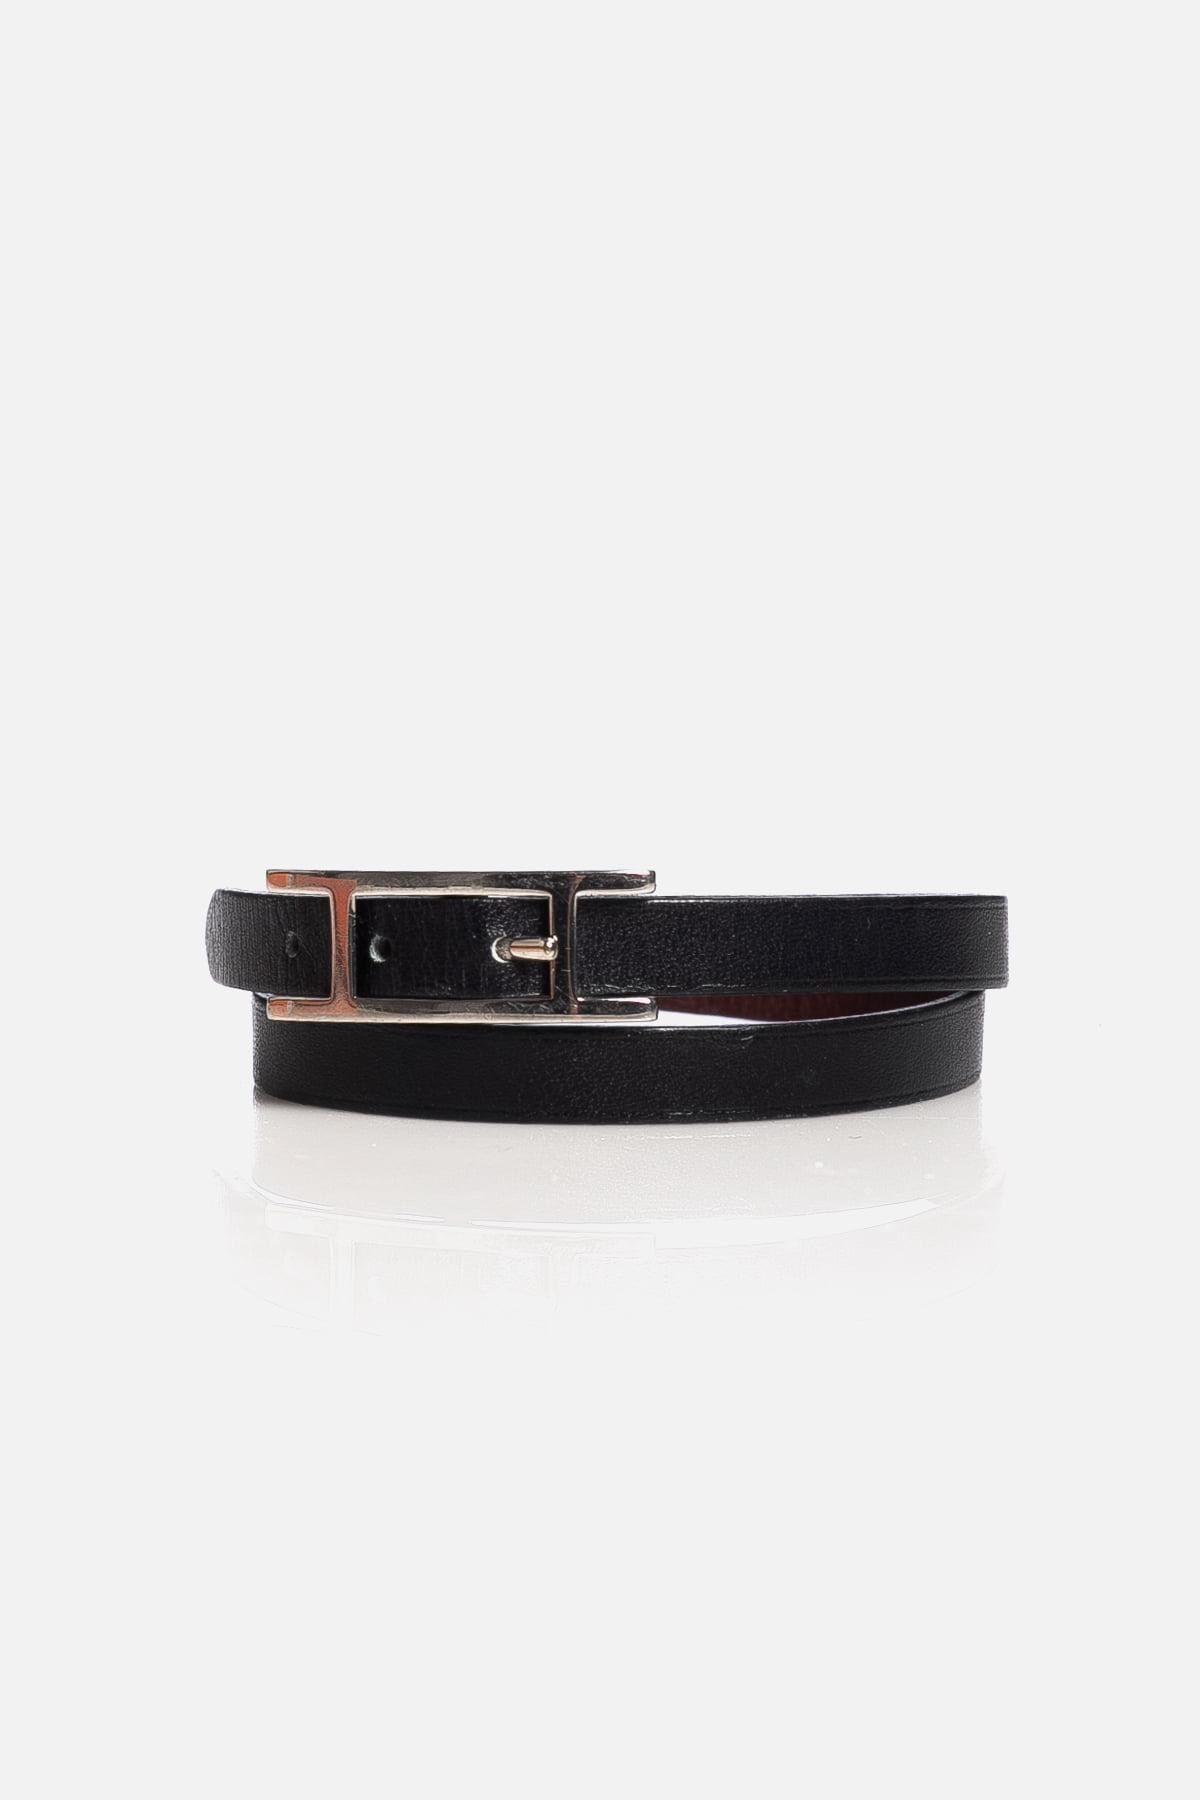 Hapi Leather Bracelet